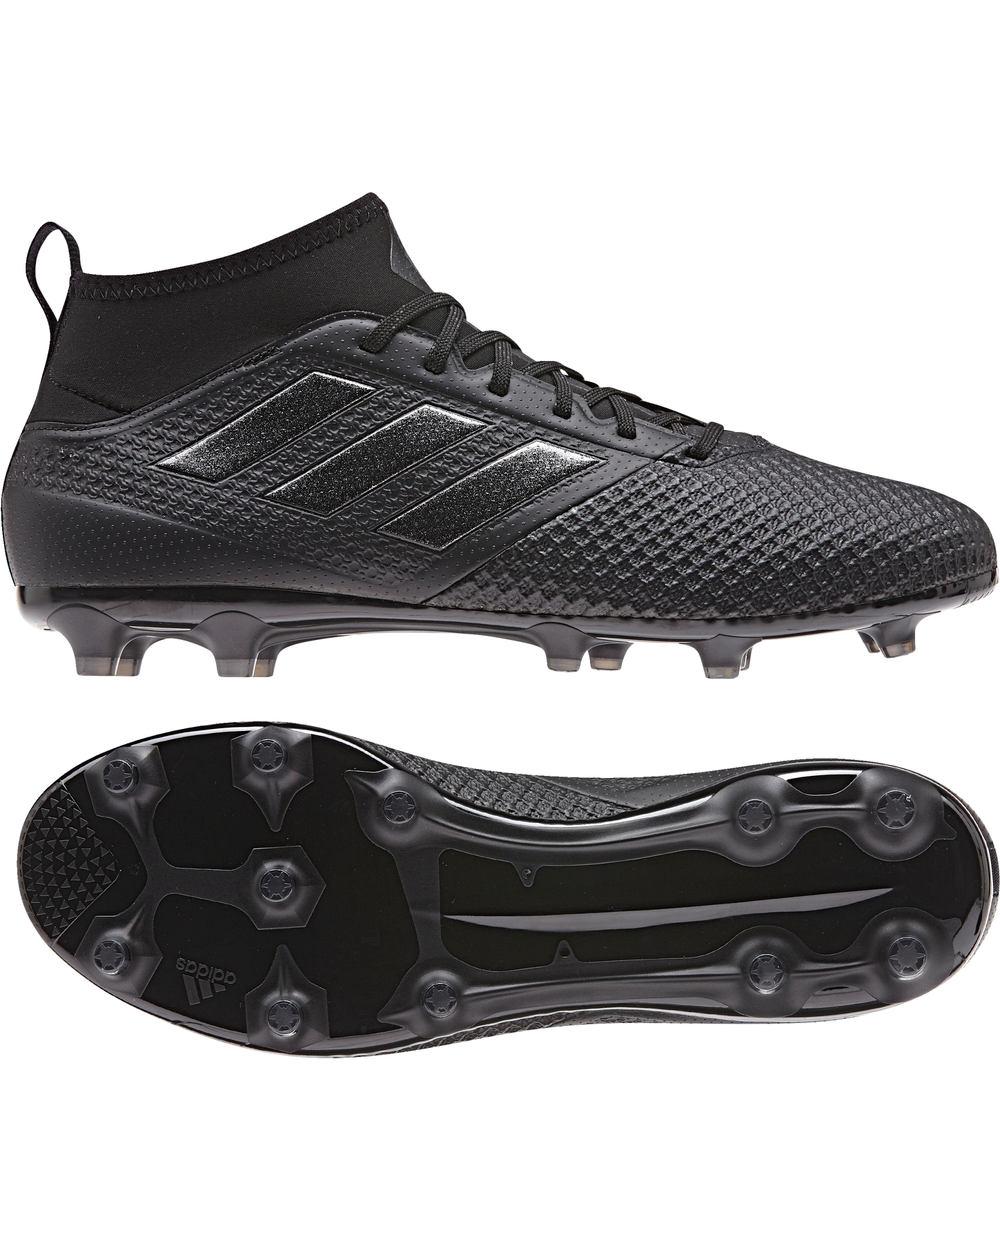 scarpe calcio adidas nere